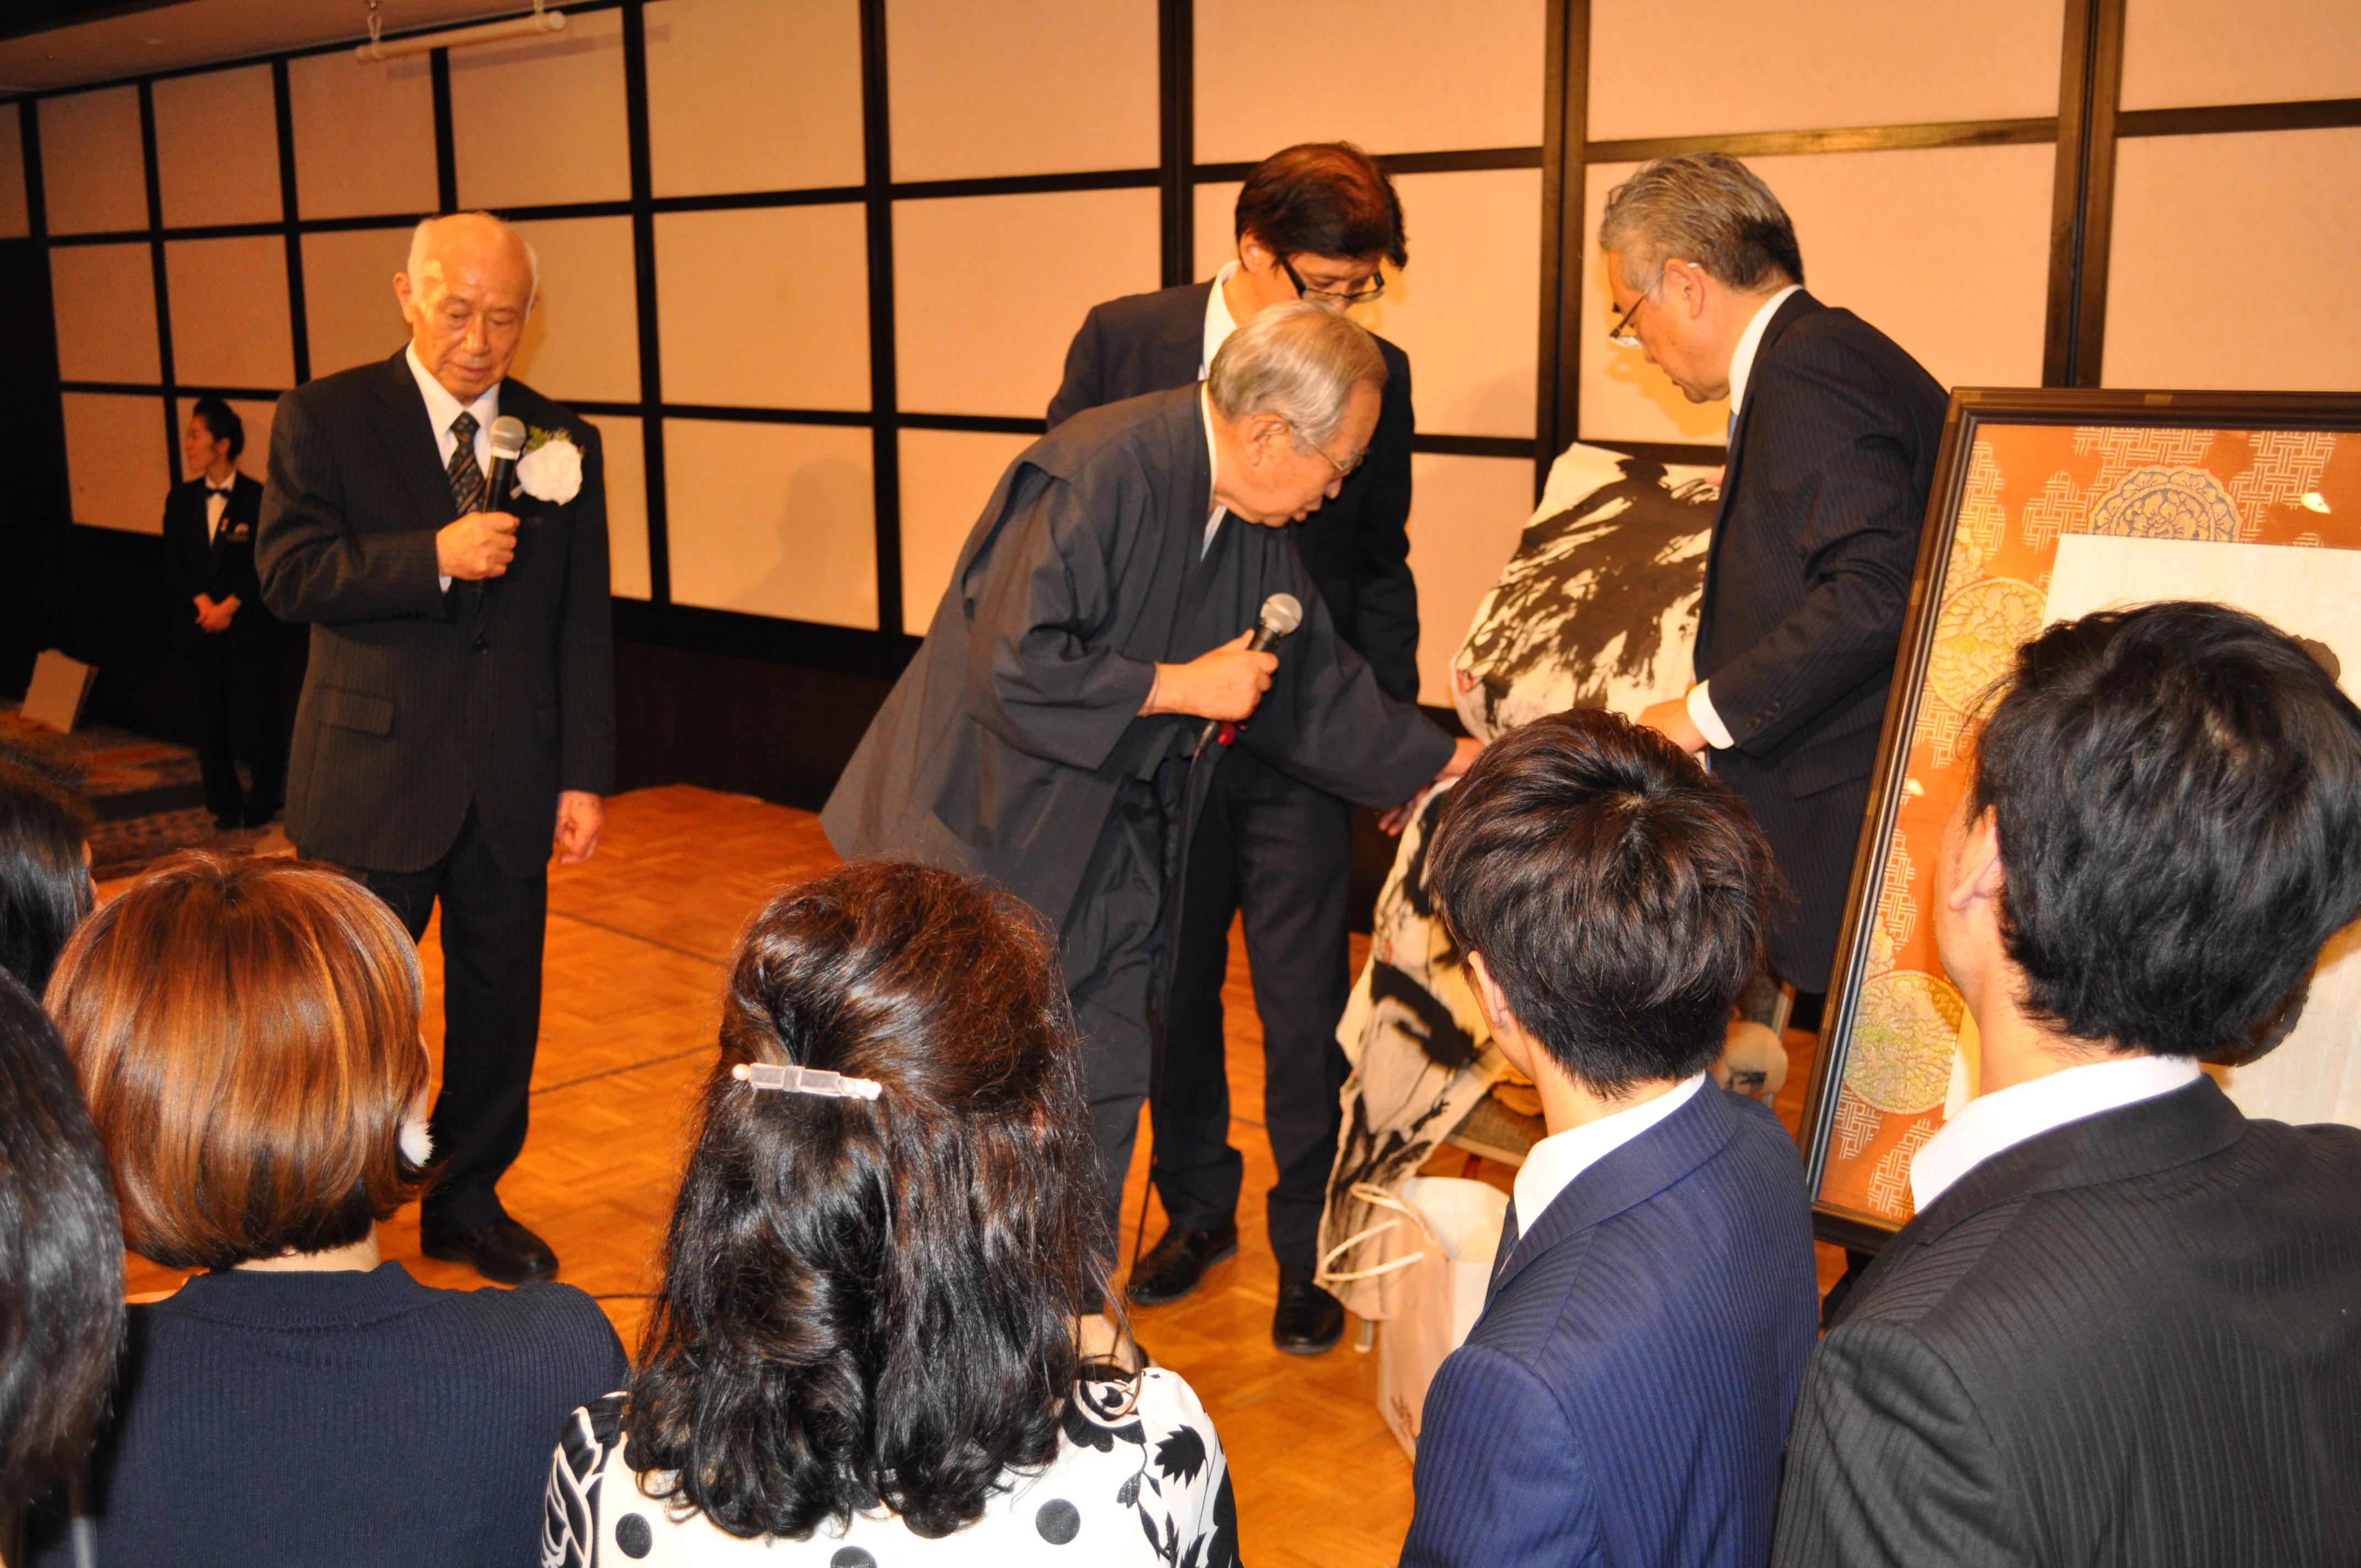 DSC 0578 - 第6回思風会全国大会2018in東京開催